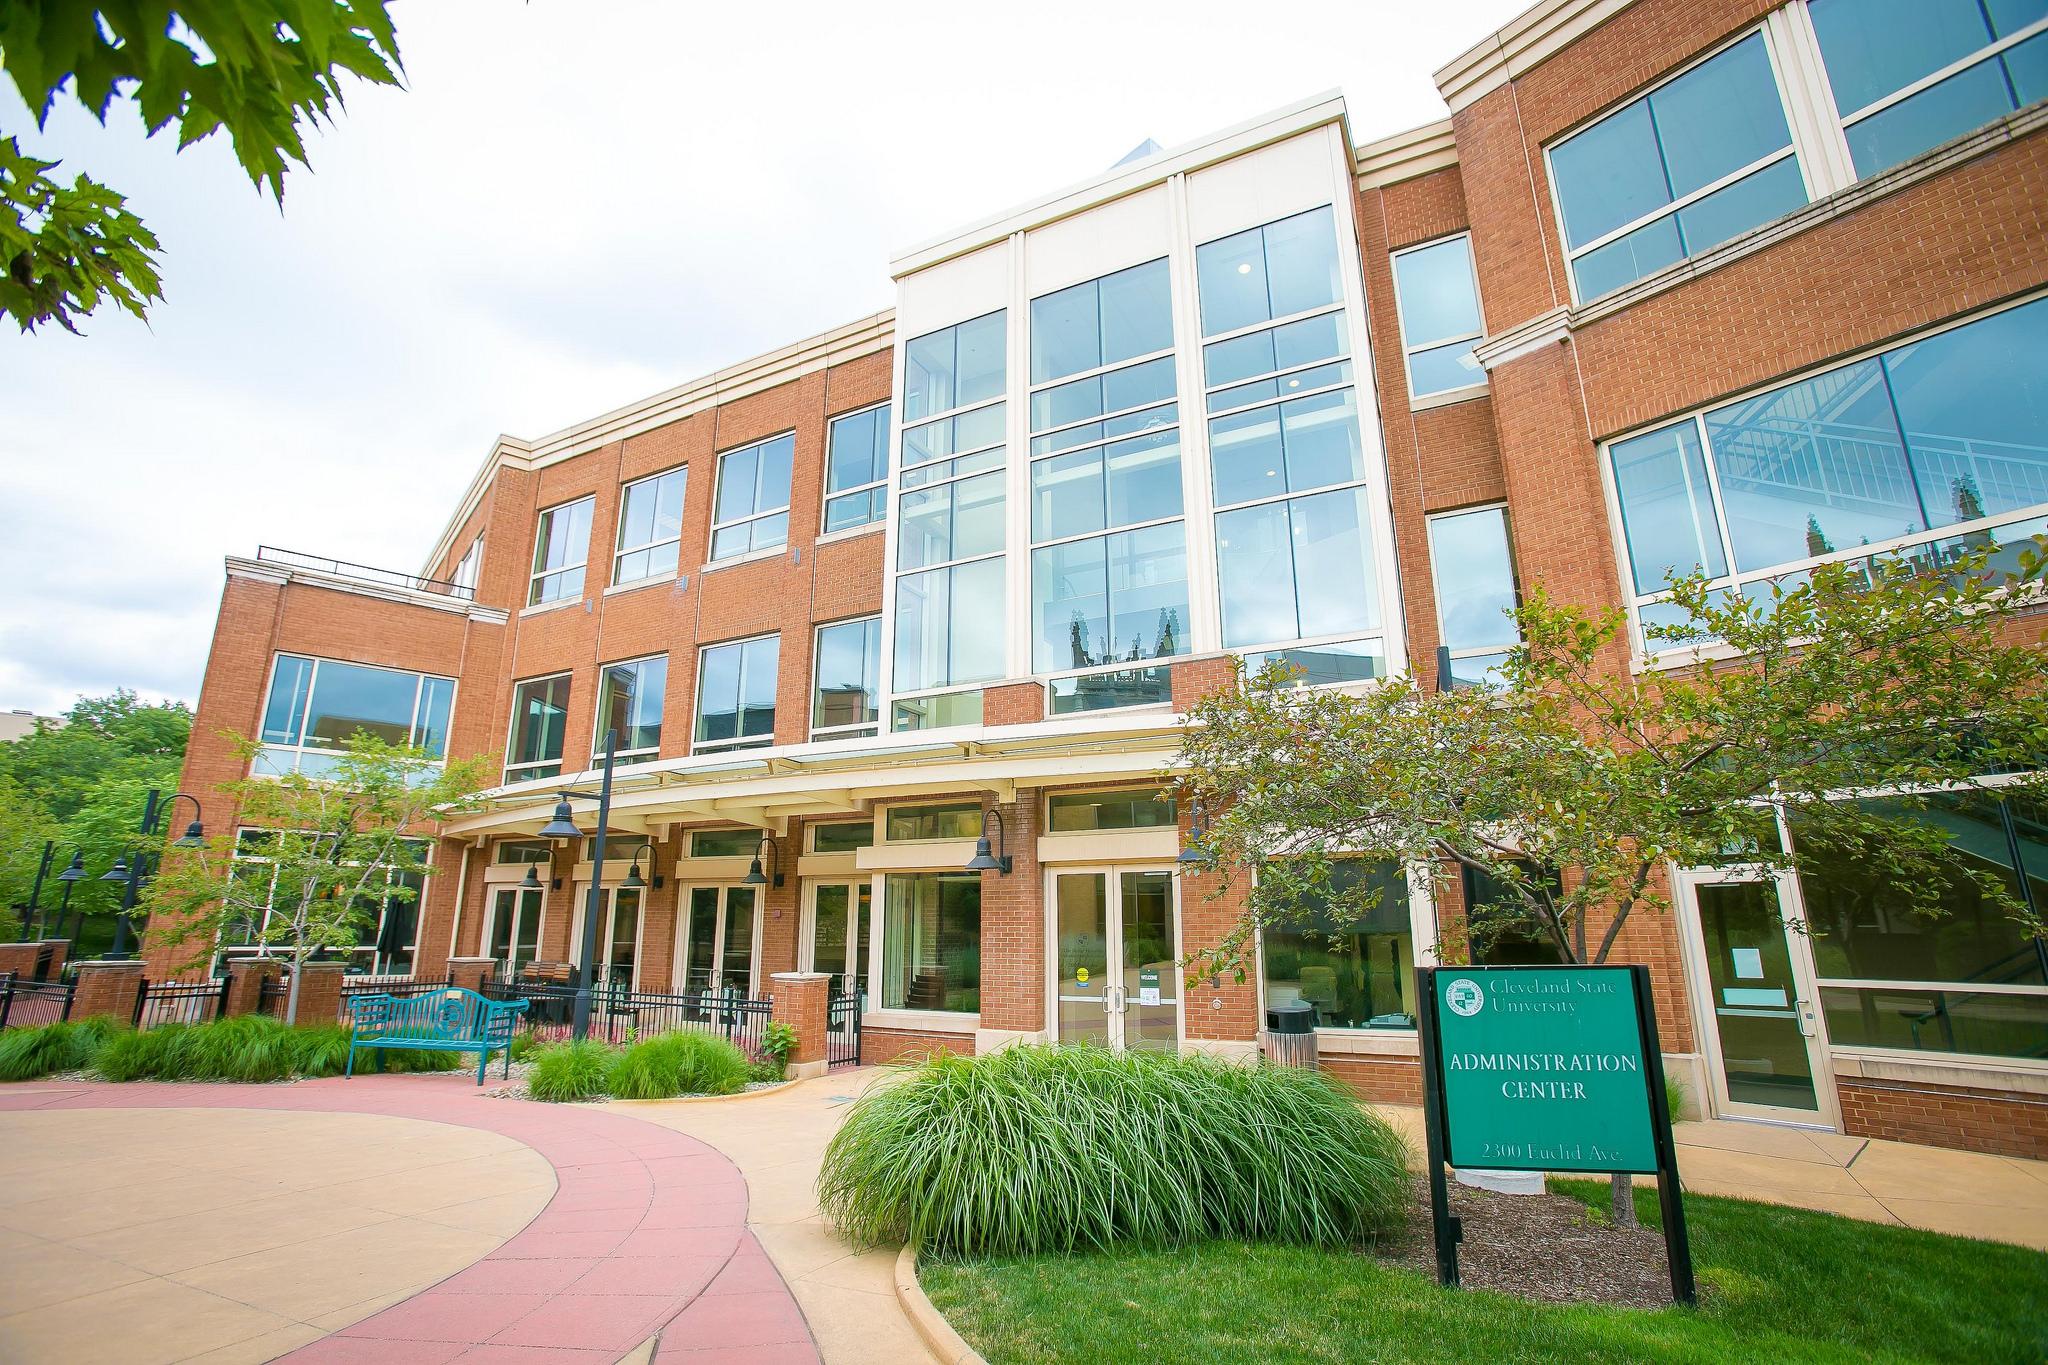 Cleveland State University | Parker Hannifin Administration Center